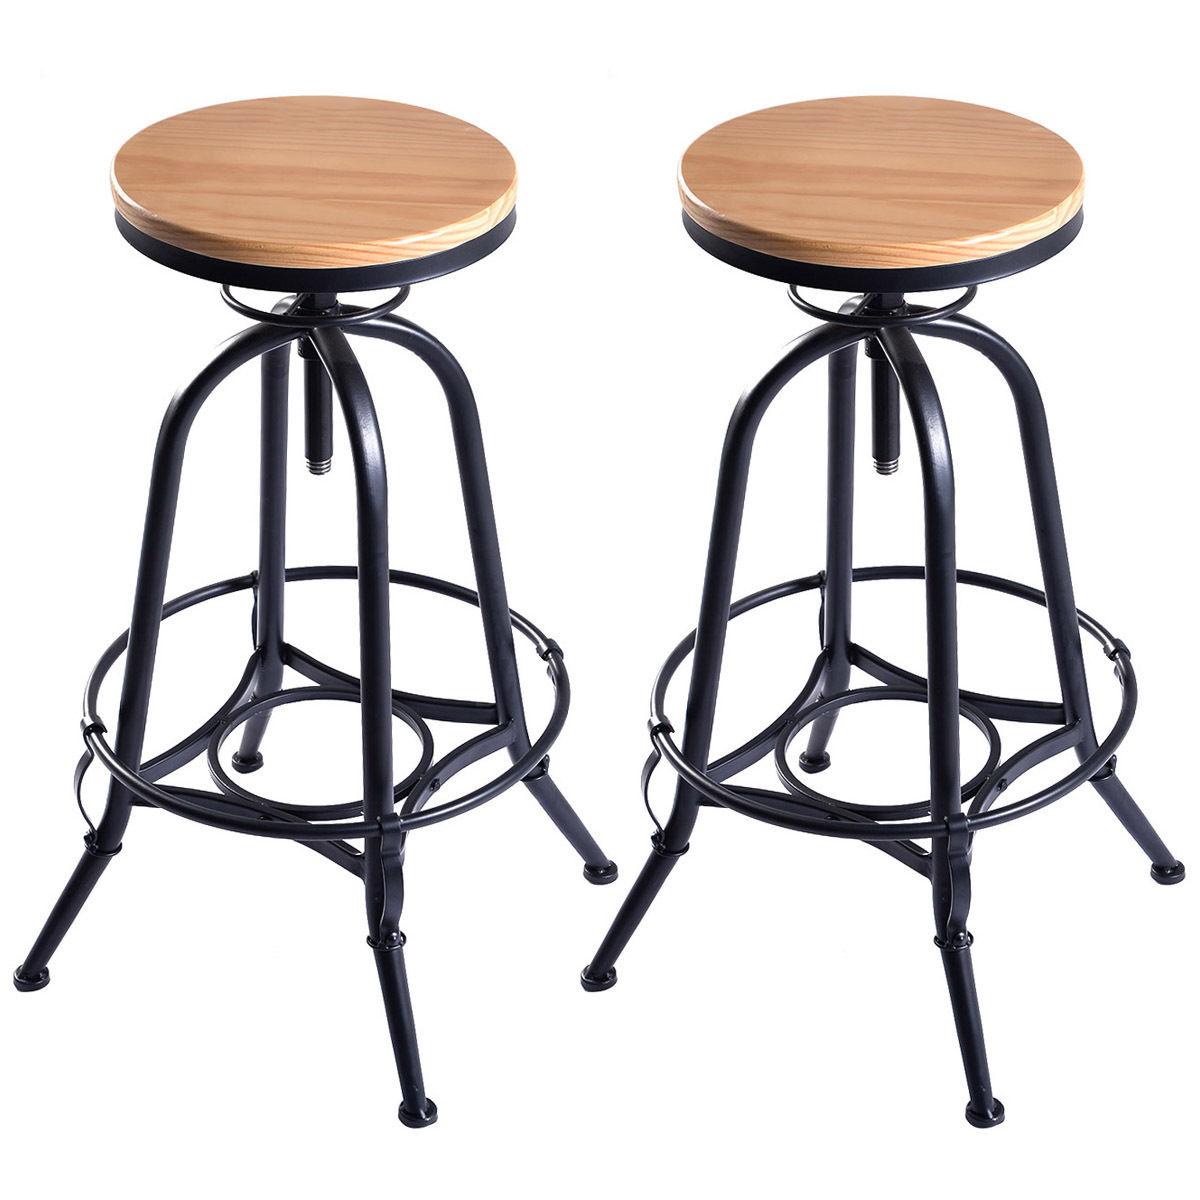 stool chair adjustable patio hanging giantex set of 2 vintage bar stools industrial wood top metal design pub chairs swivel hw51305